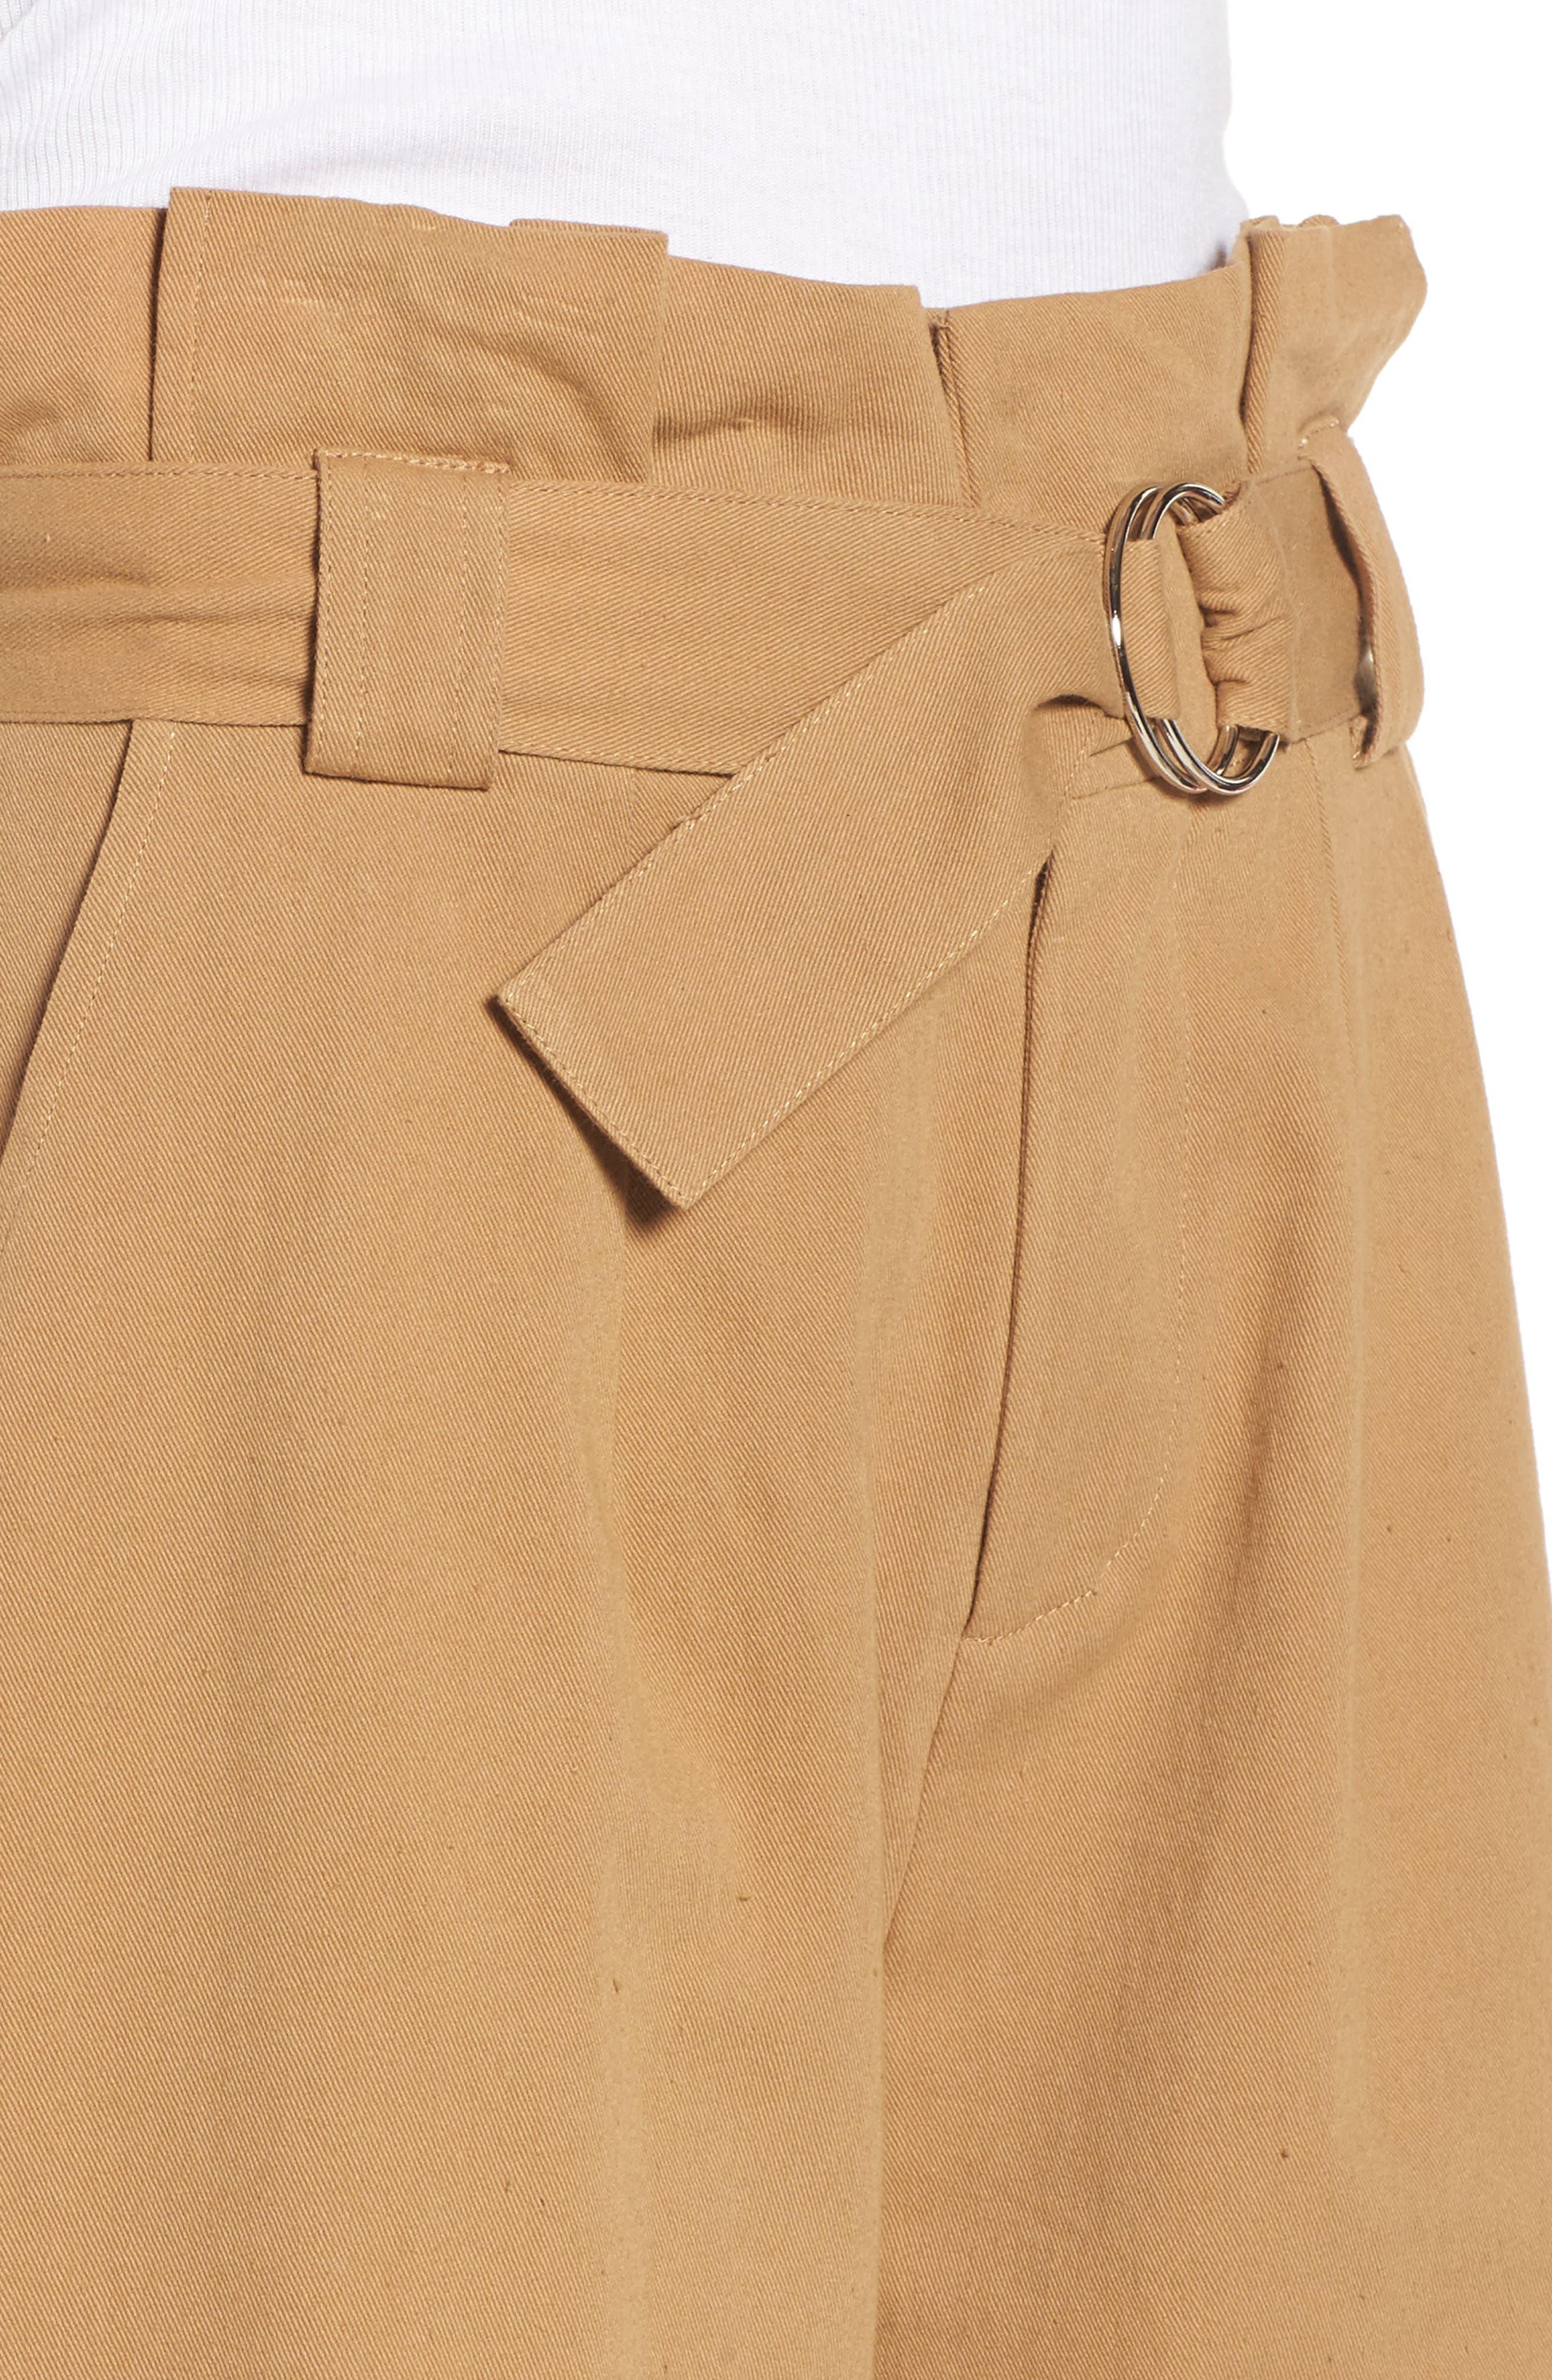 Paperbag Waist Crop Pants,                             Alternate thumbnail 4, color,                             250